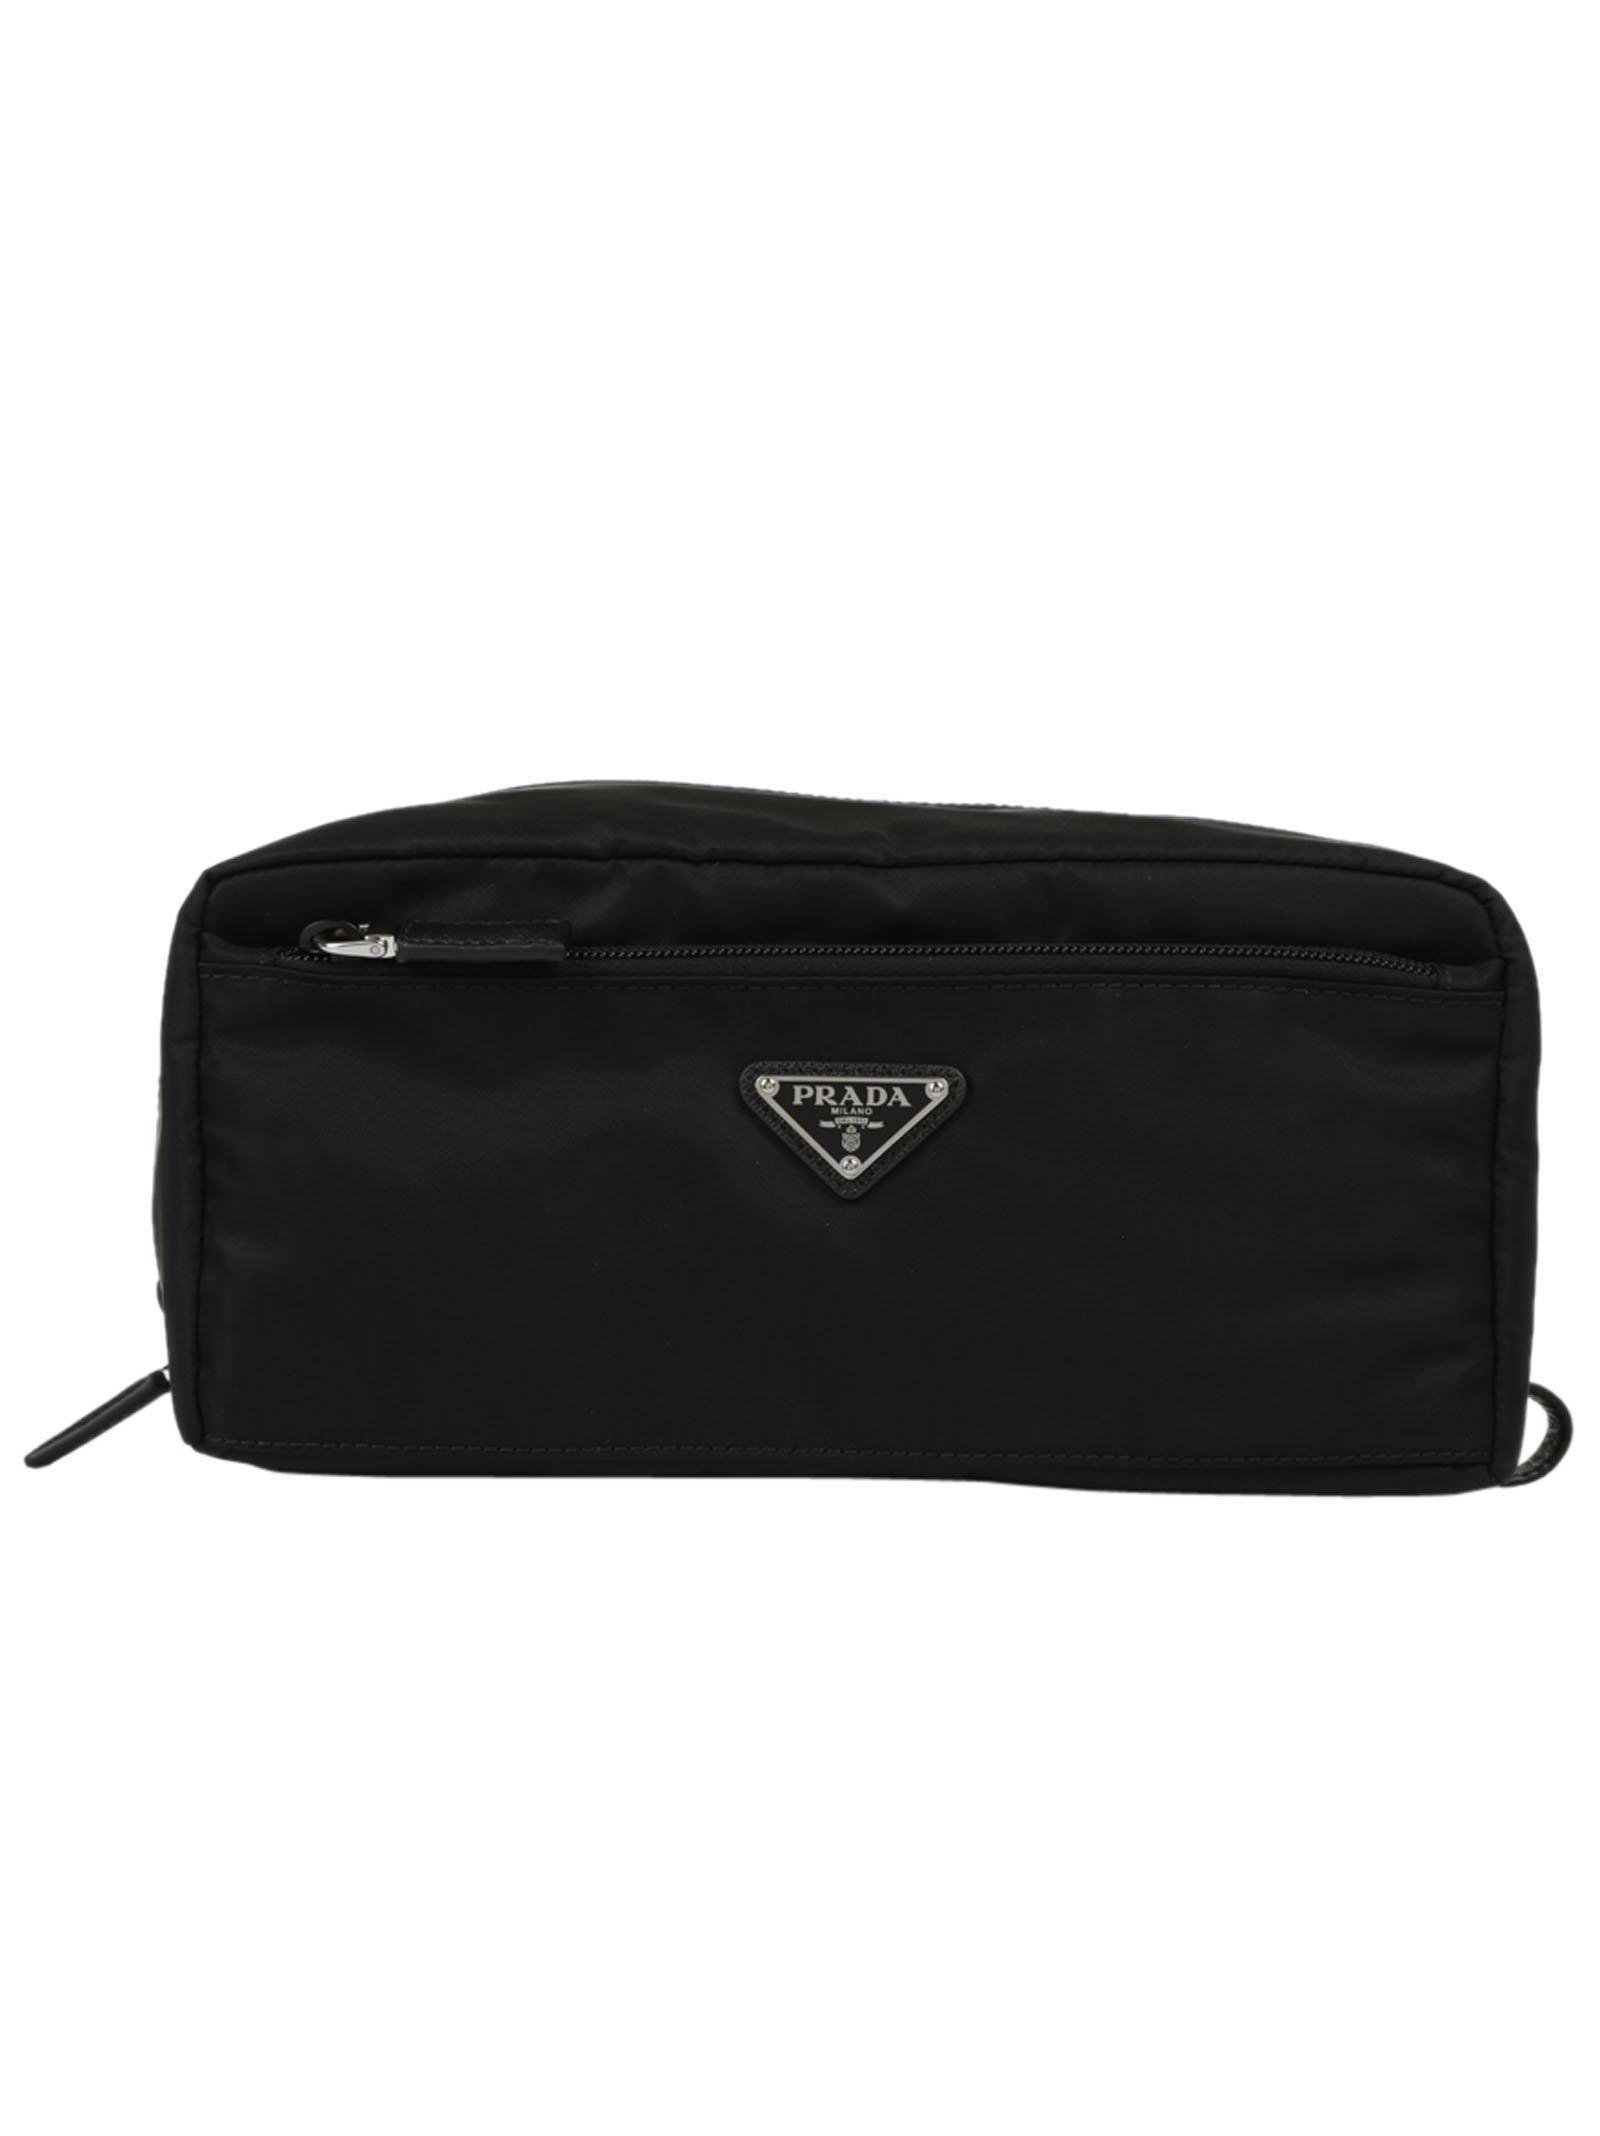 Lyst - Prada Logo Toiletry Bag in Black 86727274c5